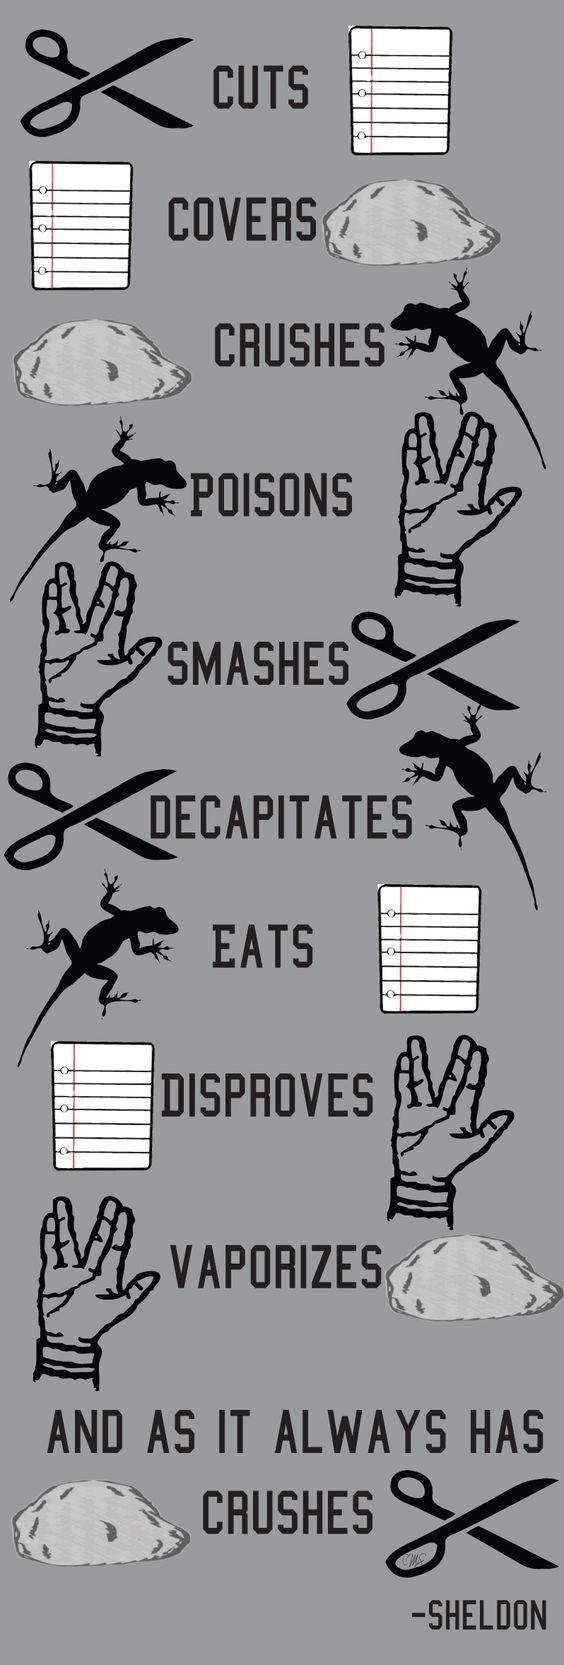 Big bang theory rock paper scissor lizard spock poster